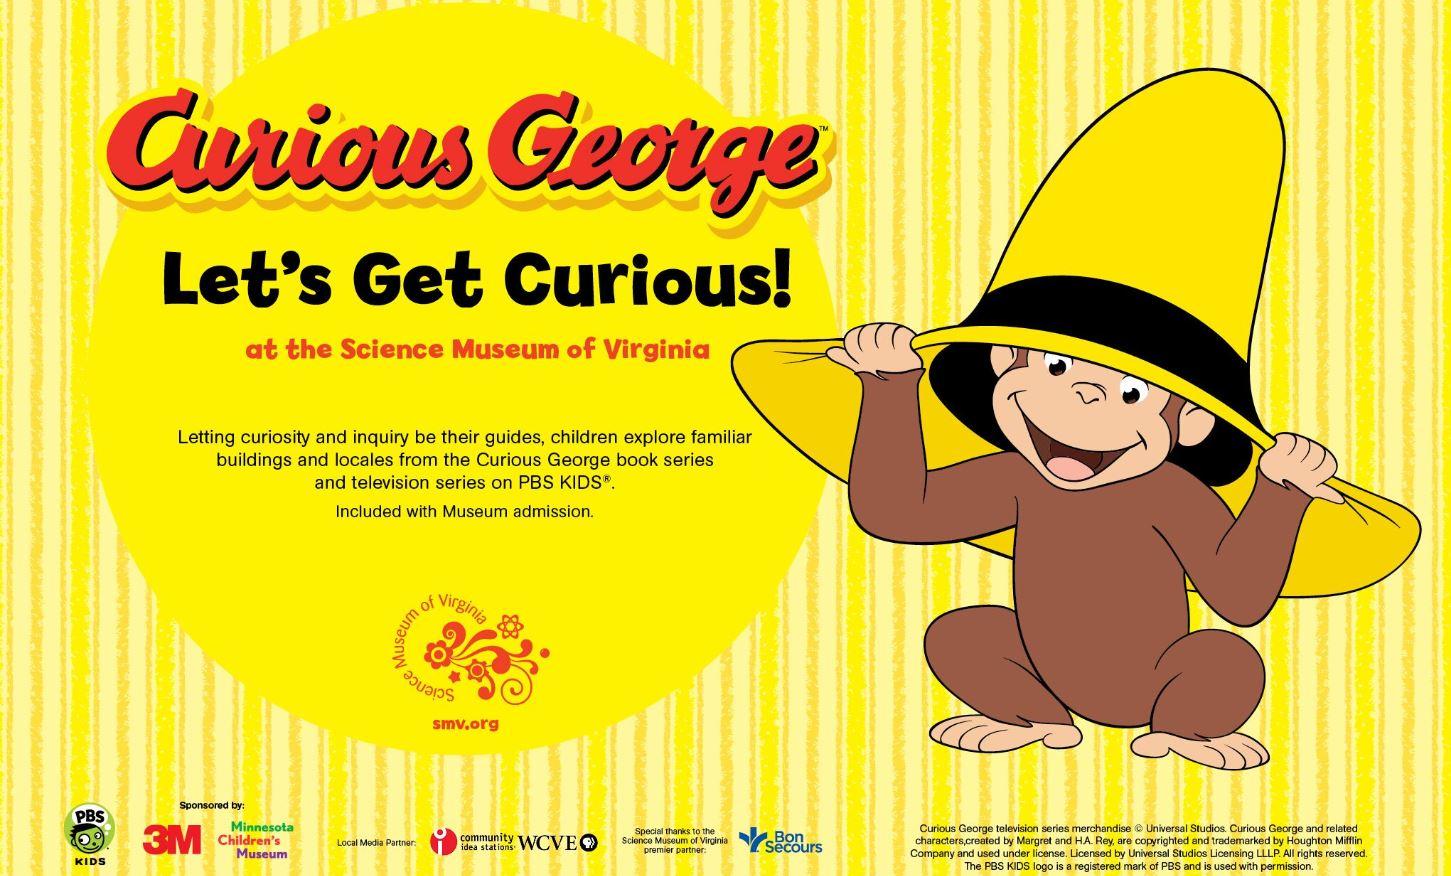 curious george_1547137699946.JPG.jpg